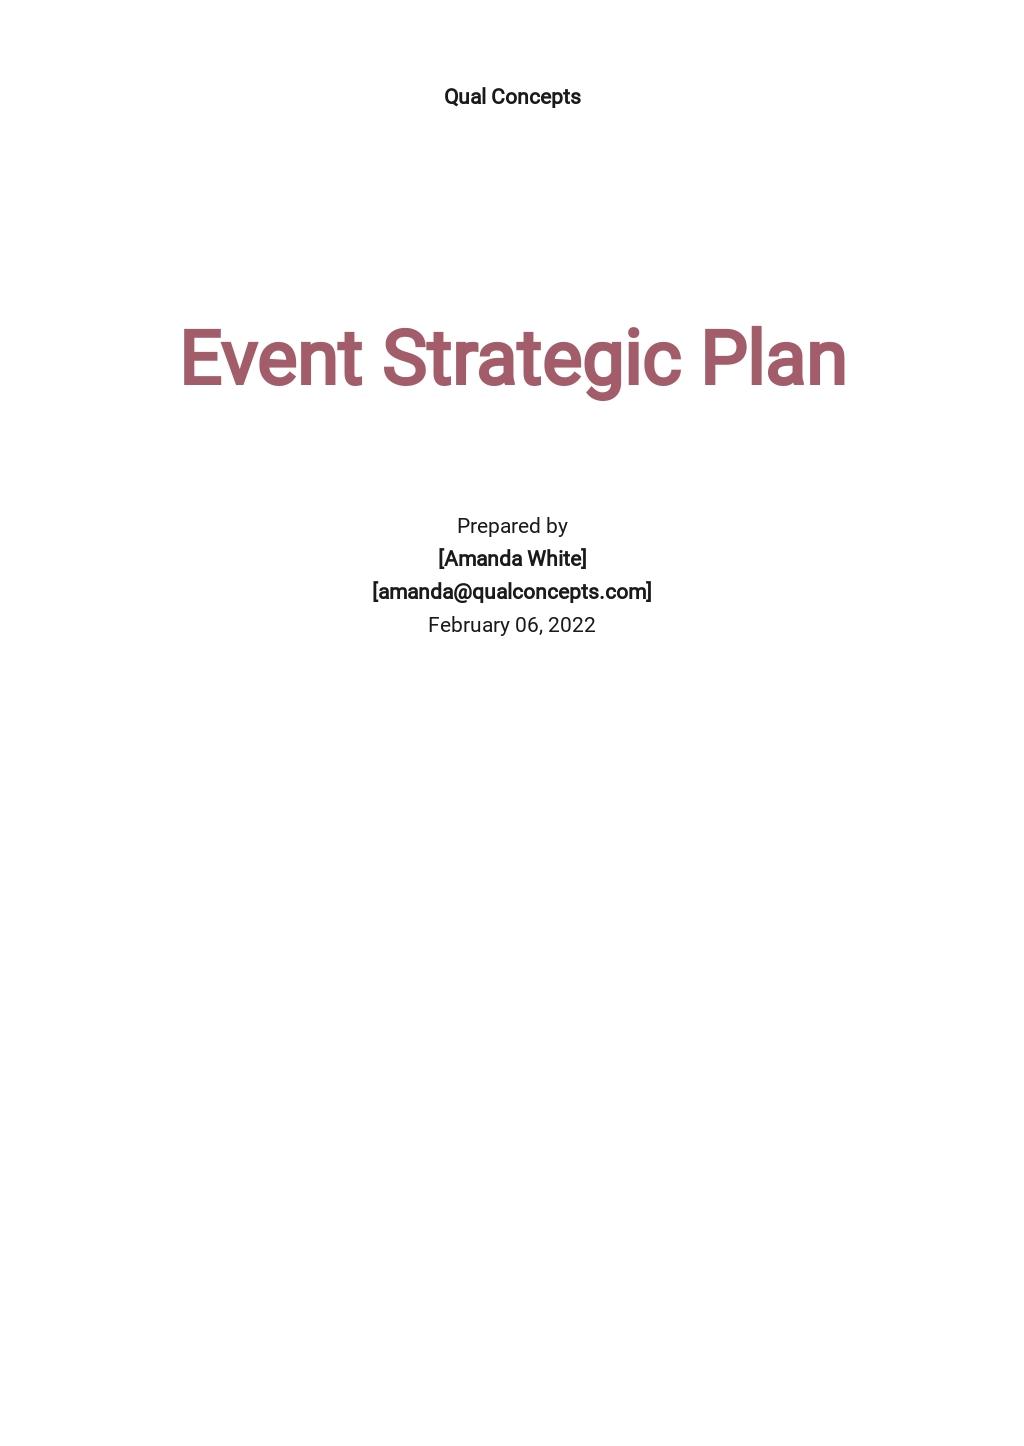 Event Strategic Plan Template